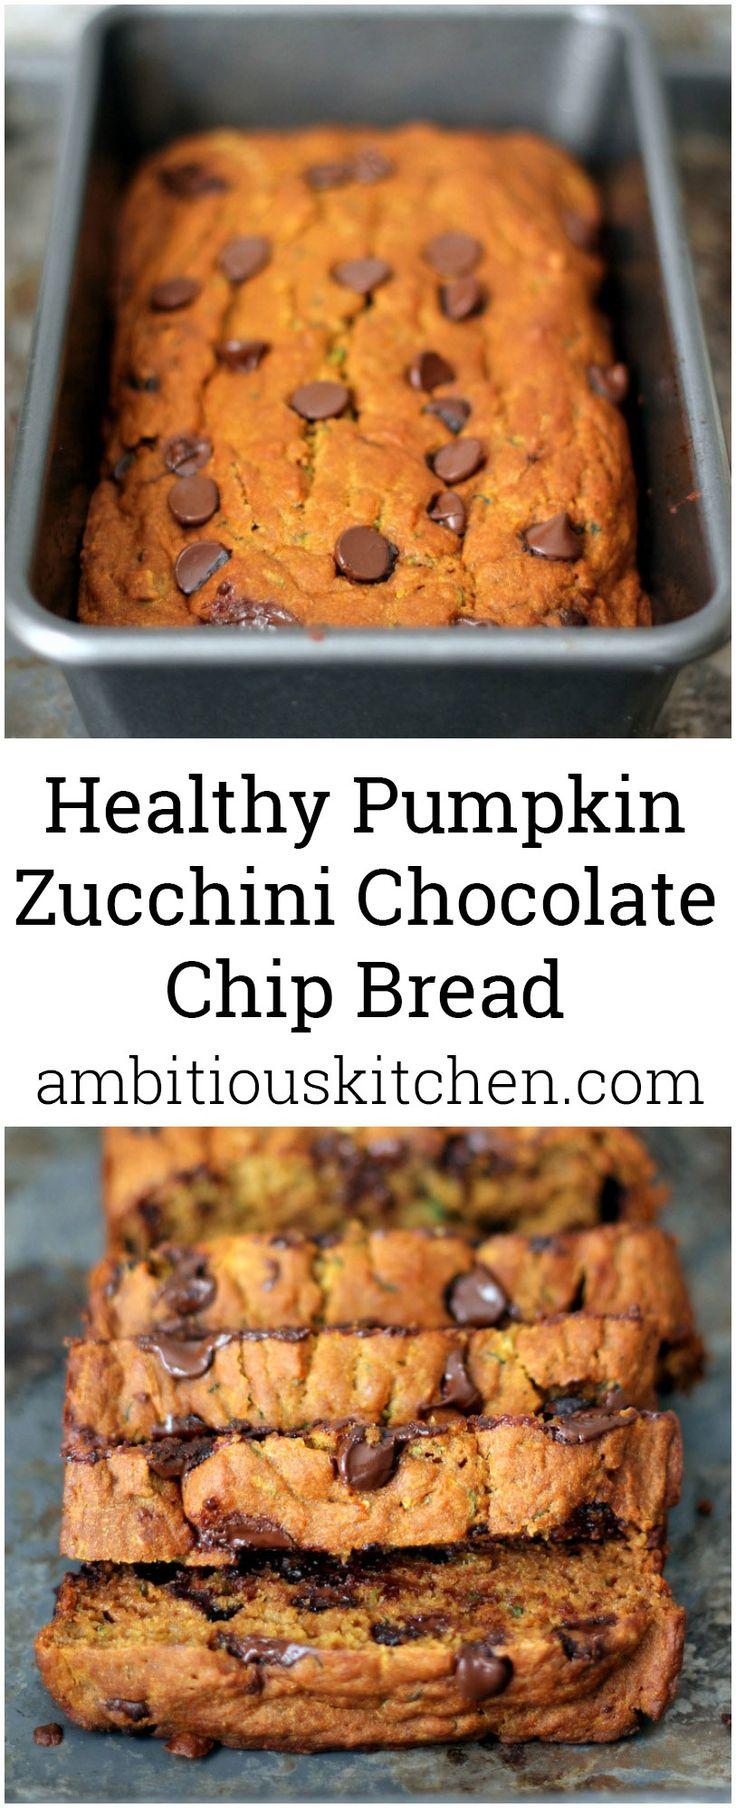 Healthy Pumpkin Zucchini Chocolate Chip Bread